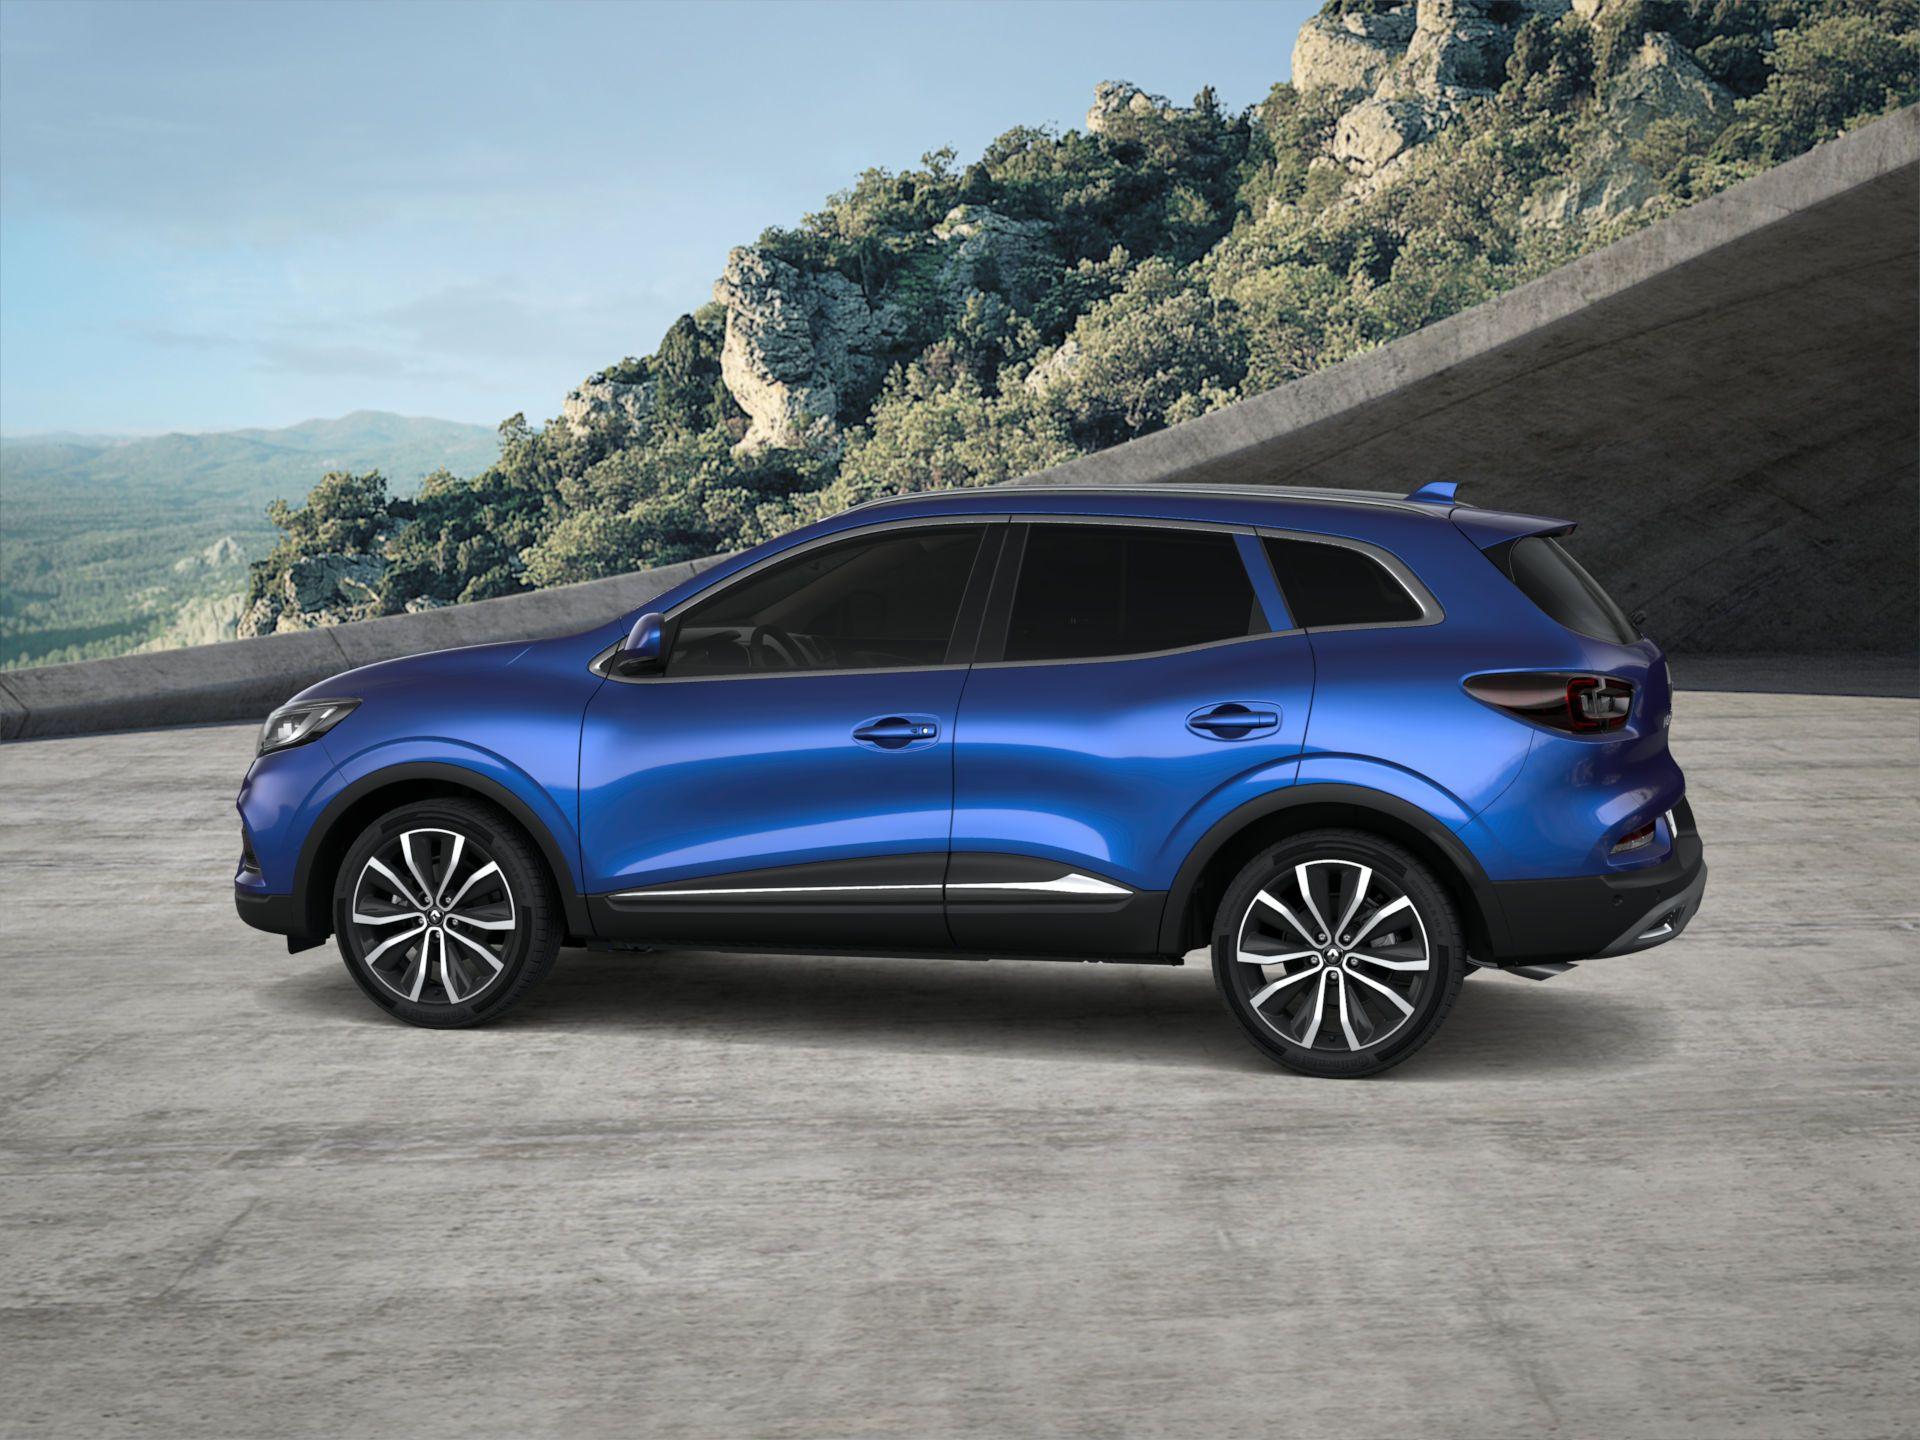 Renault Kadjar 2019 Blue Iron